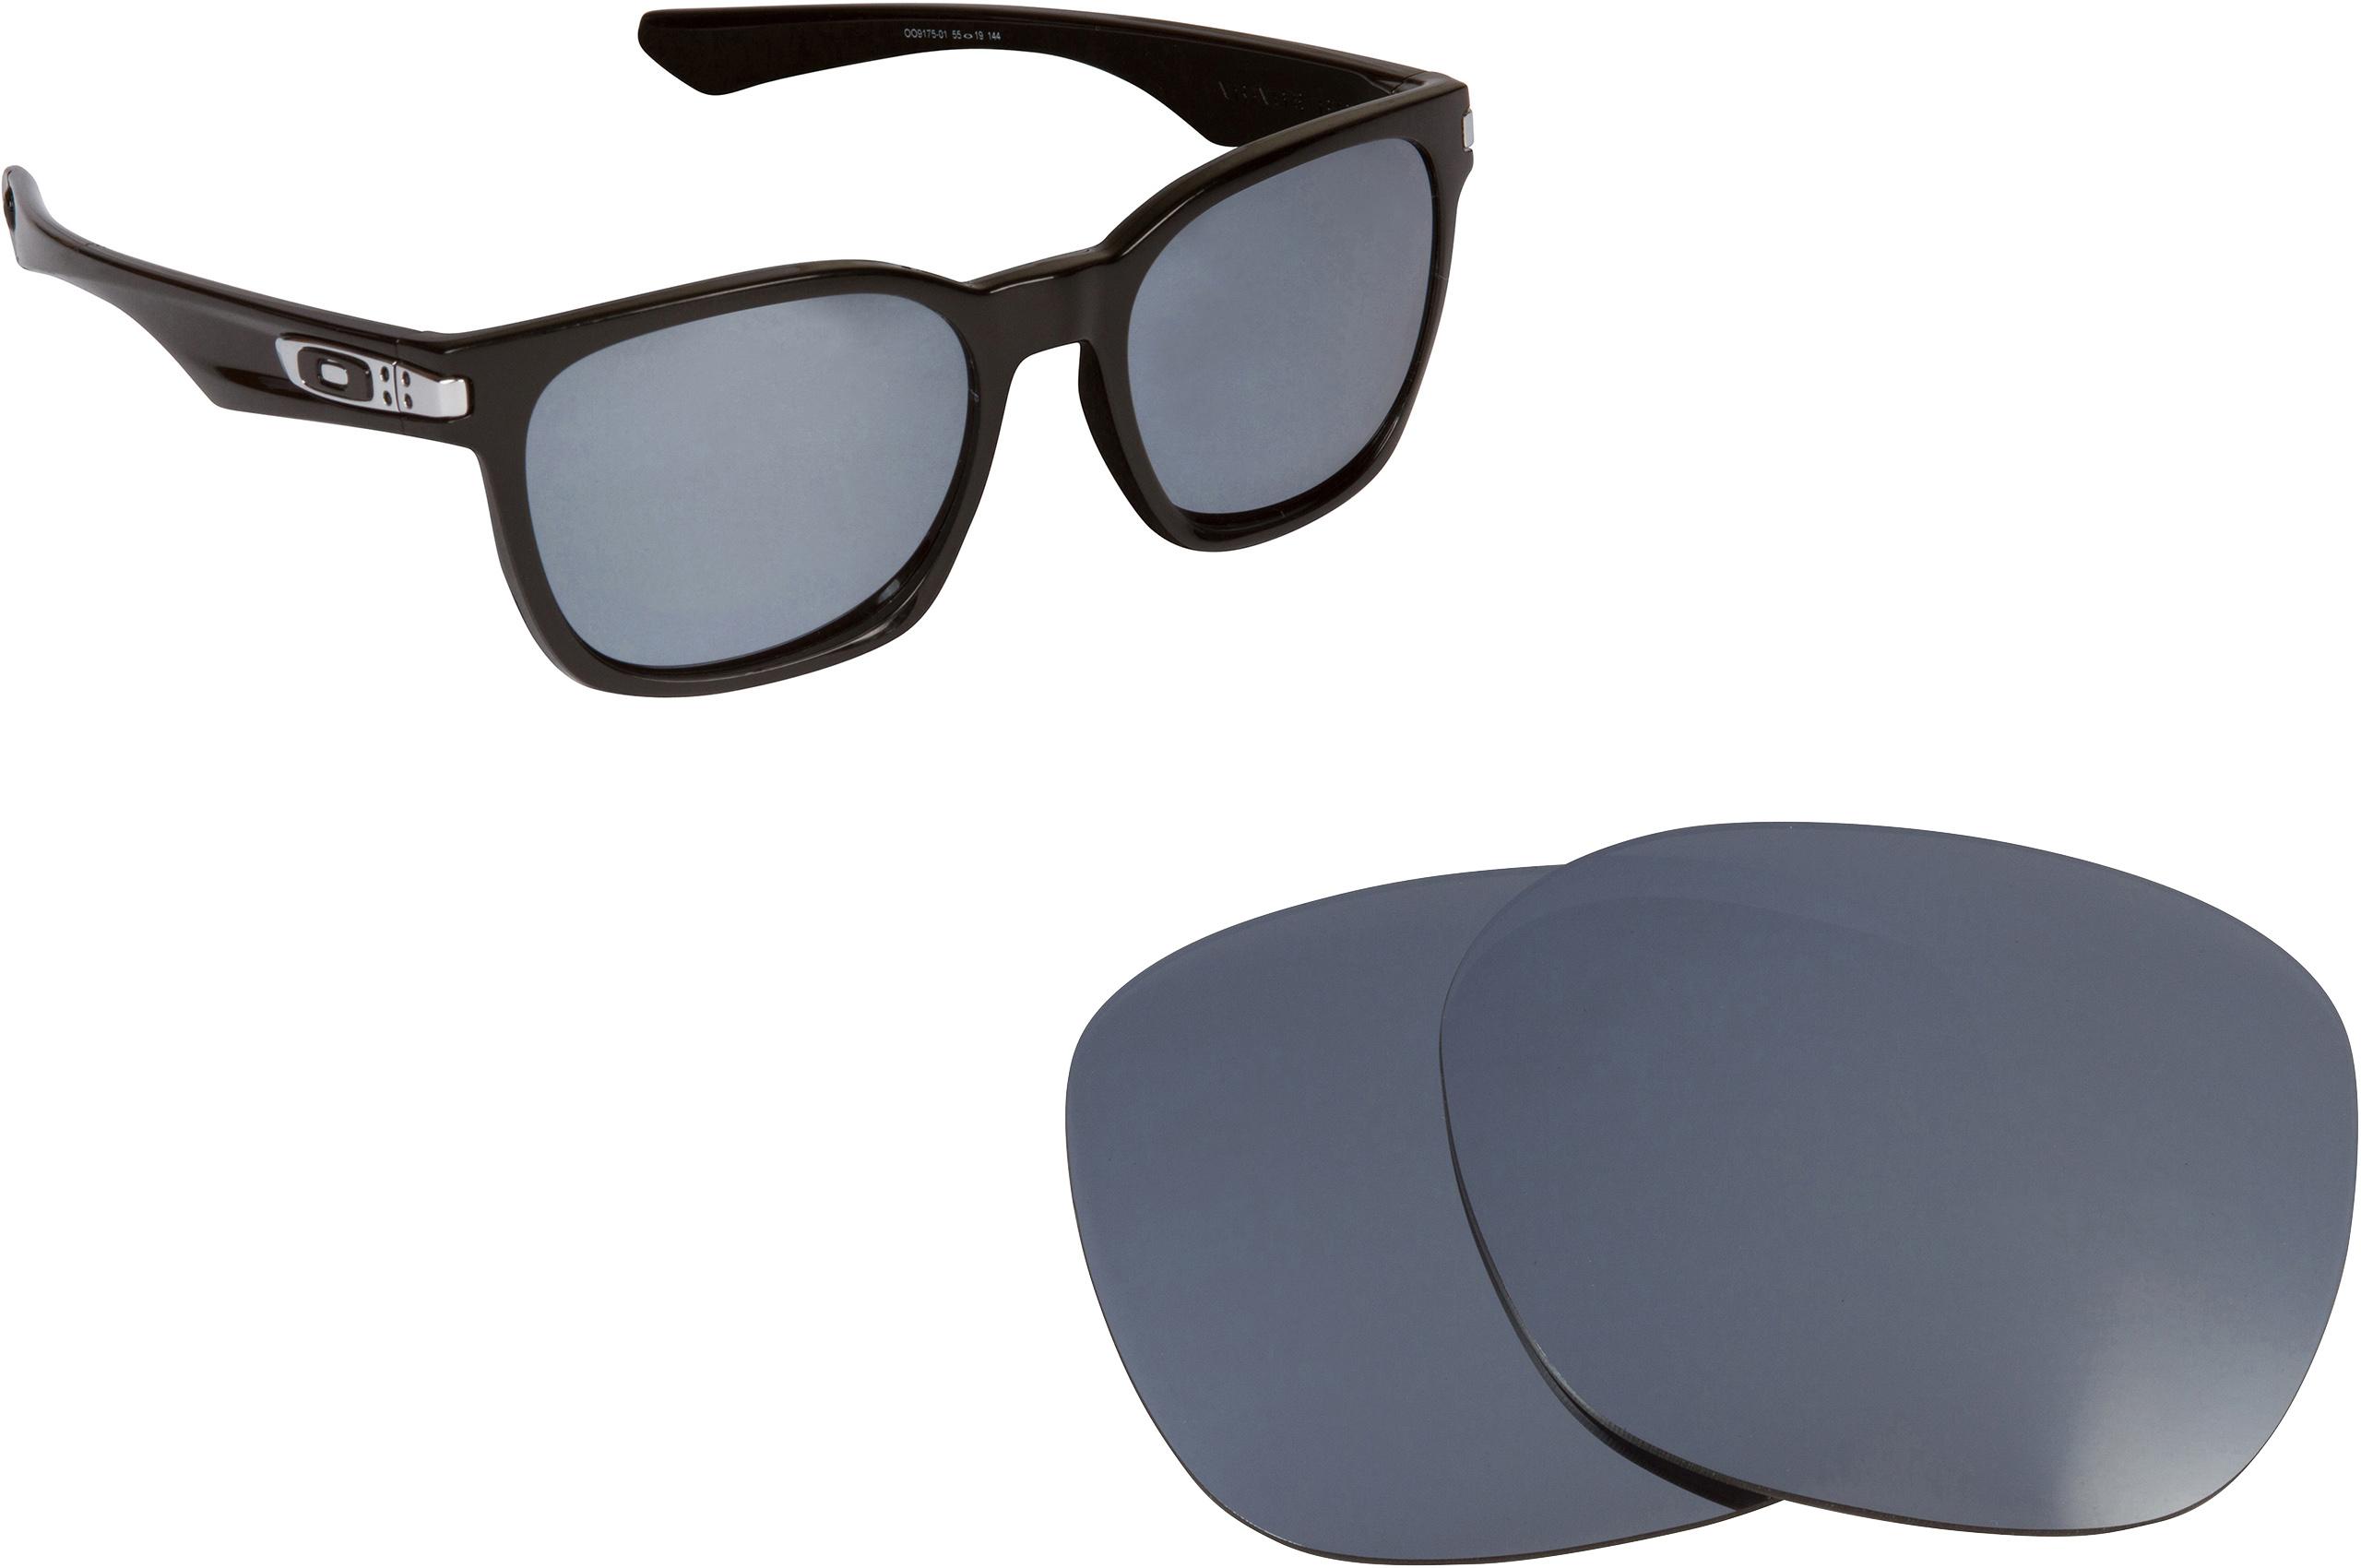 be269f2ec5 Seek Optics - SEEK Polarized Replacement Lenses for Oakley GARAGE ...